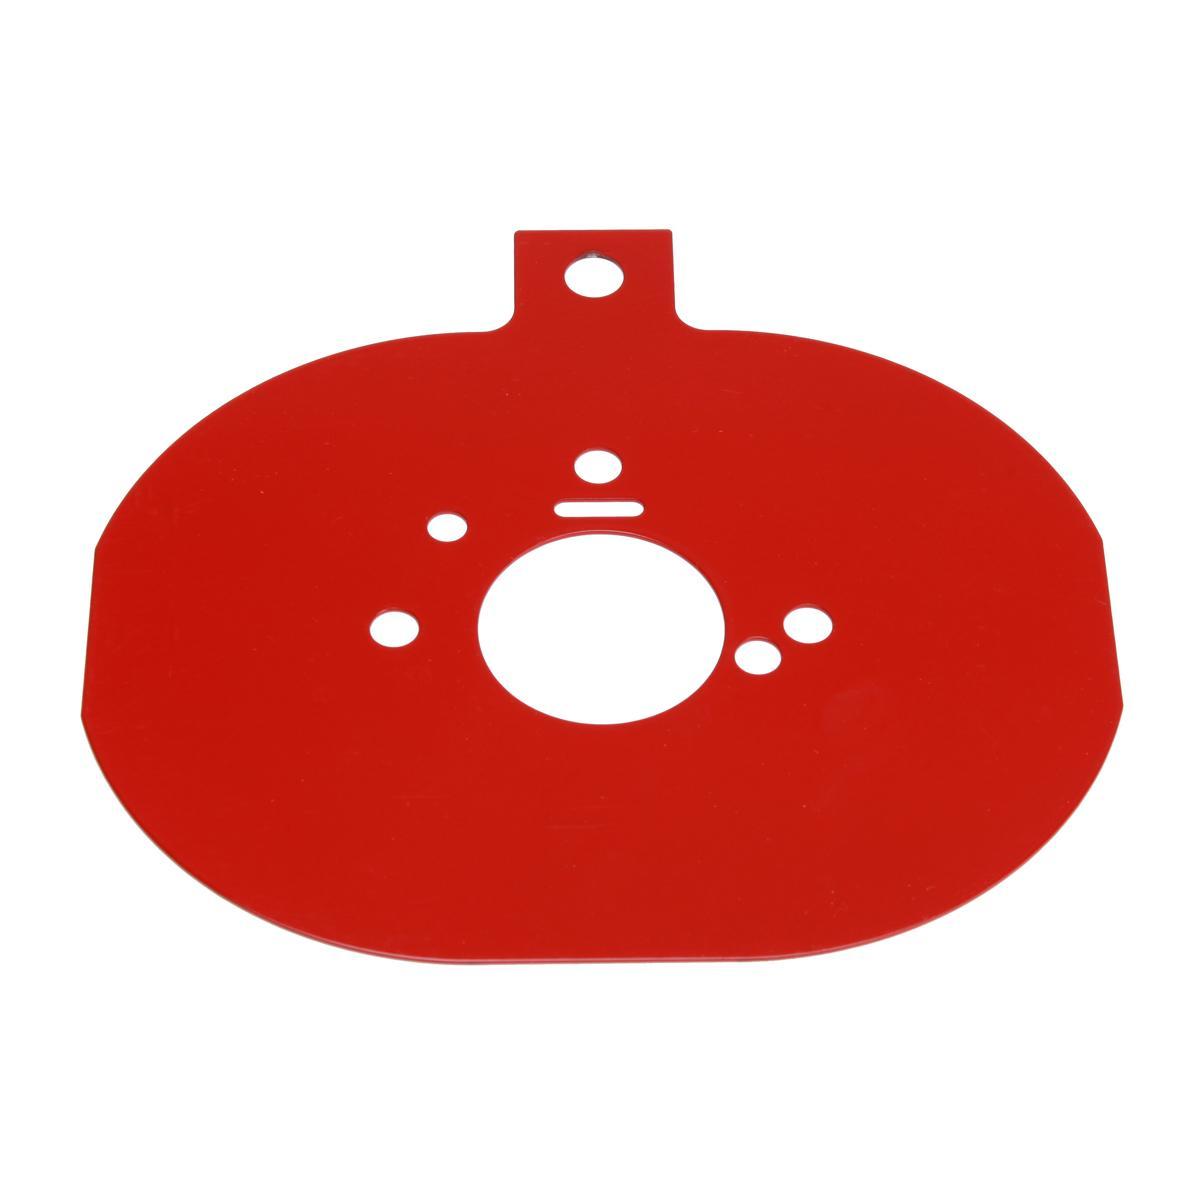 Itg jc20 baseplate 24jc20 from merlin motorsport for Motor base plate design